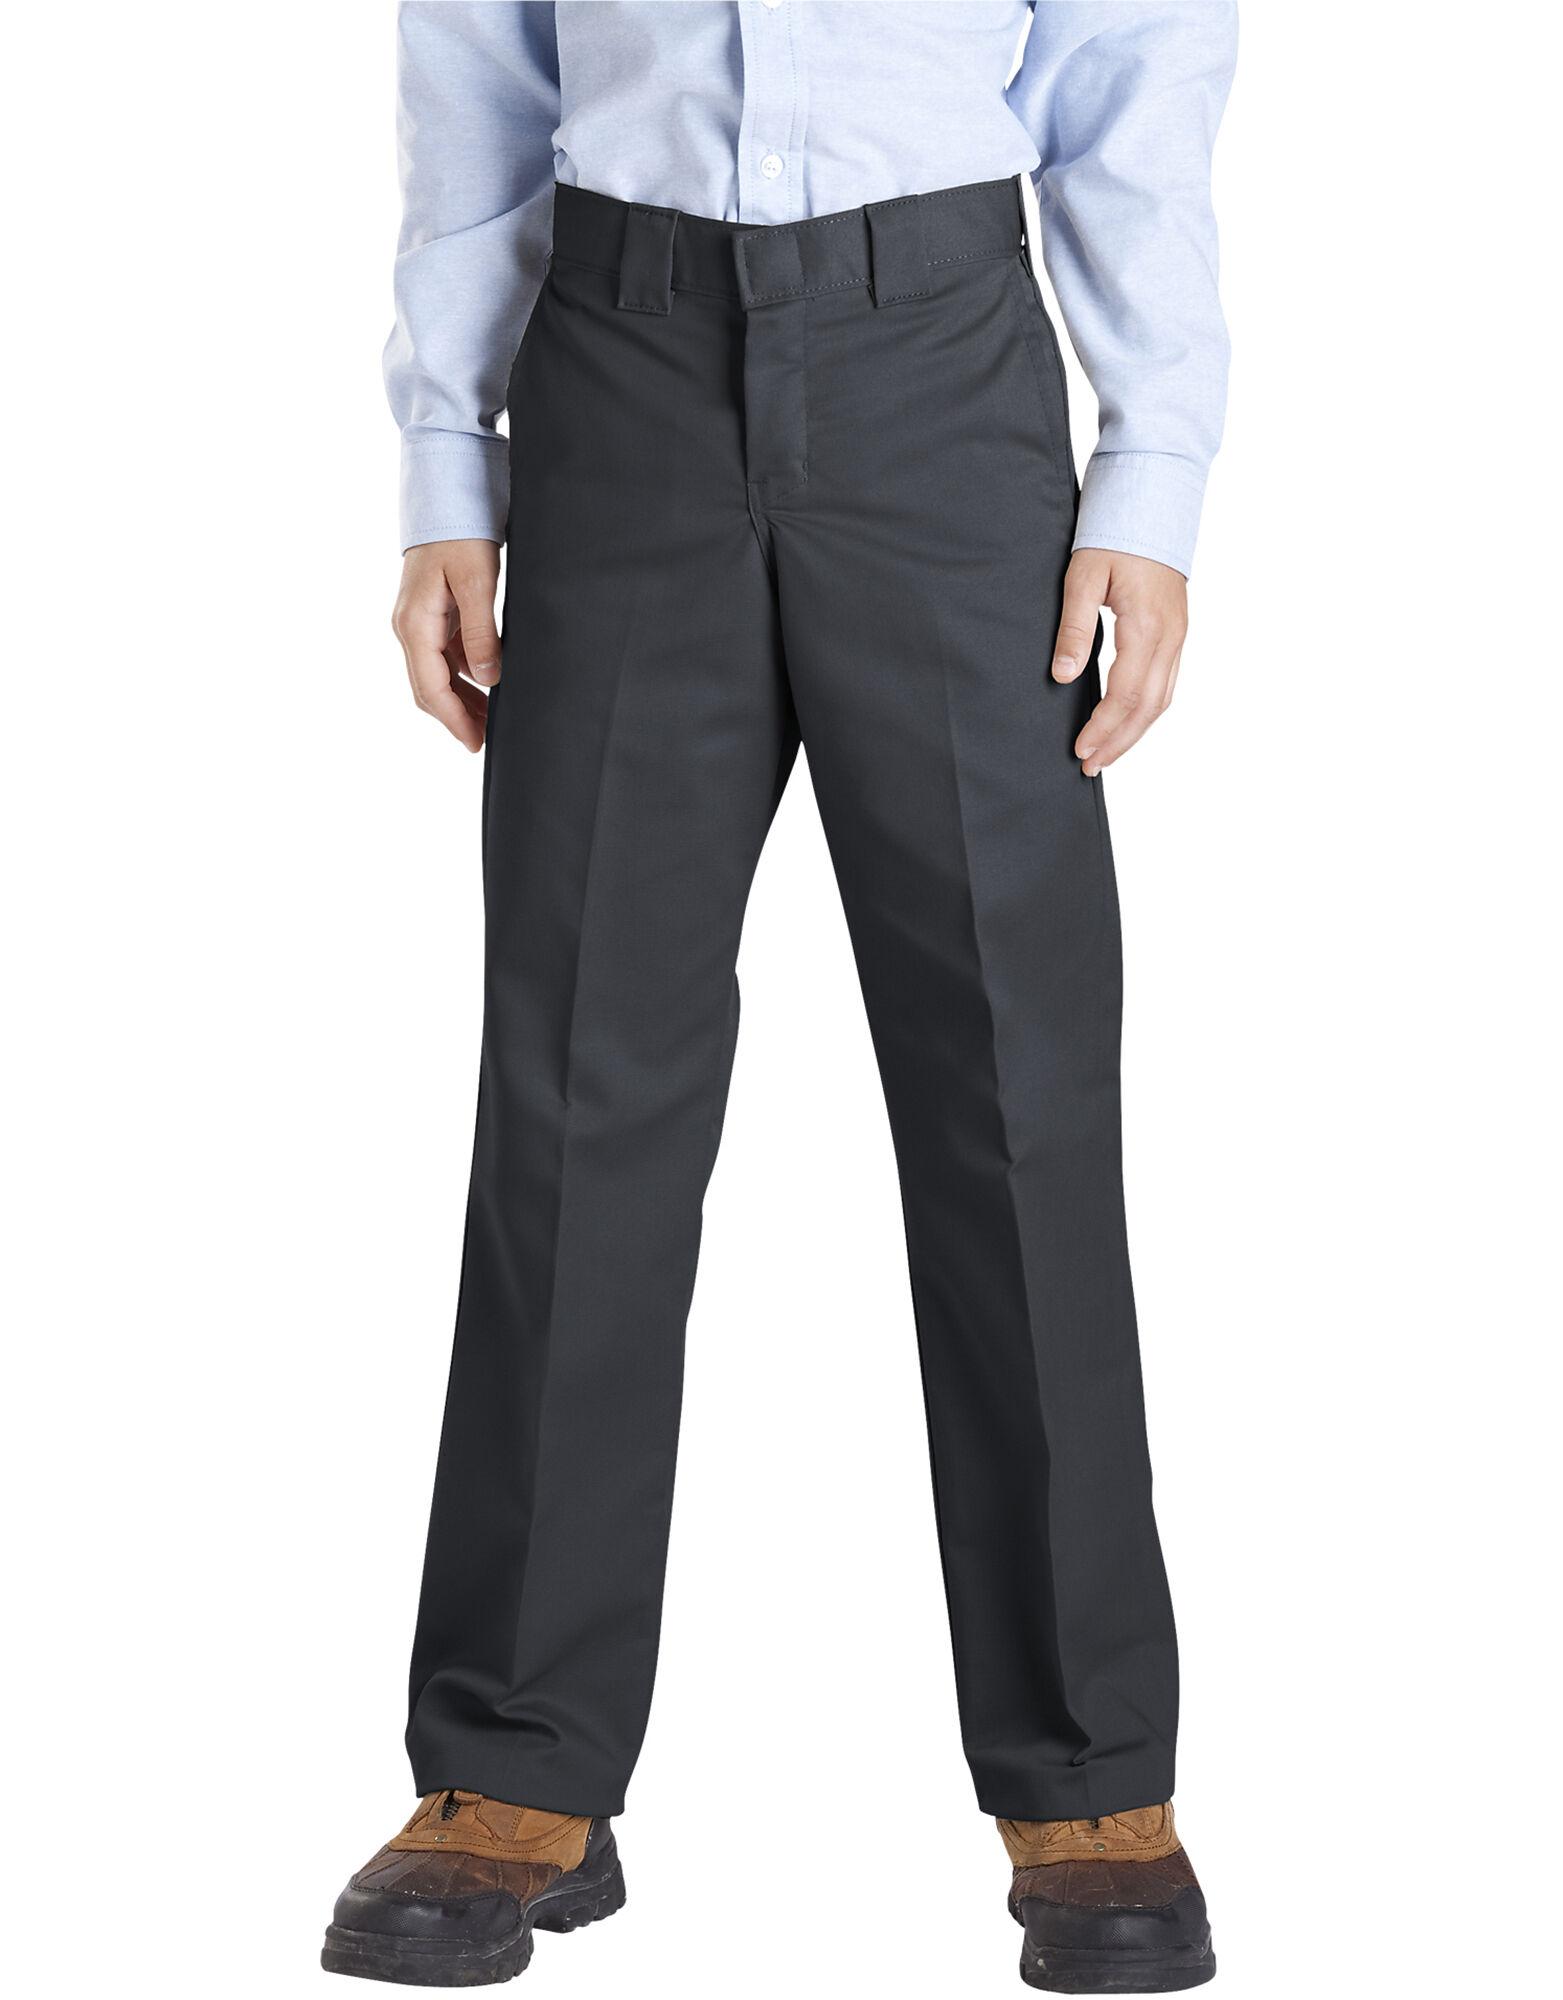 Boys Pleated Dress Pants